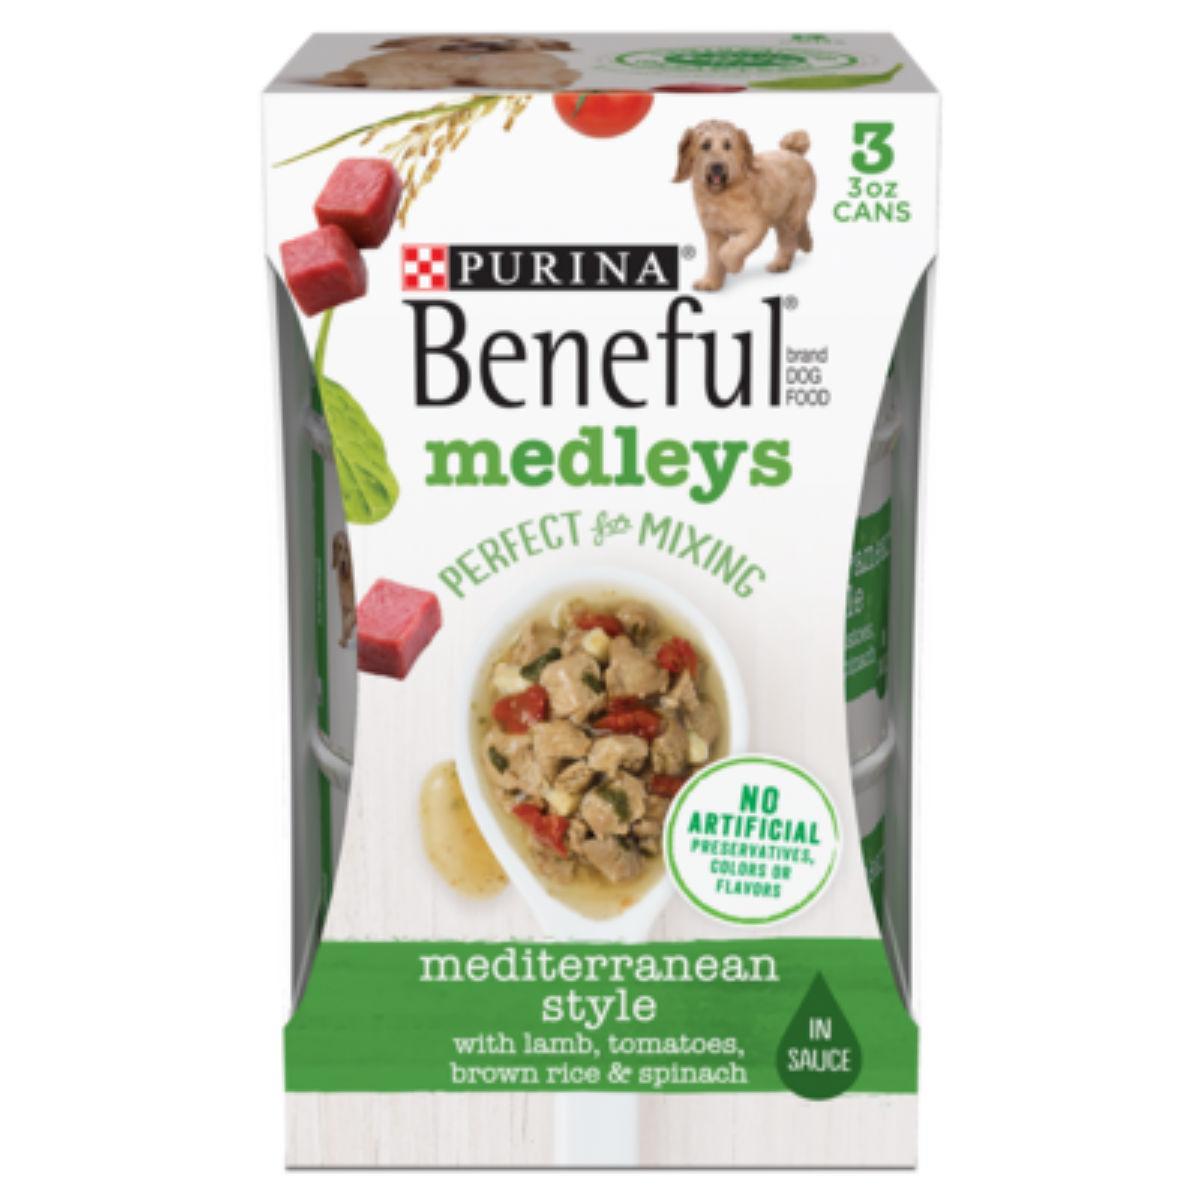 Purina Beneful Medleys Wet Dog Food - Mediterranean Style